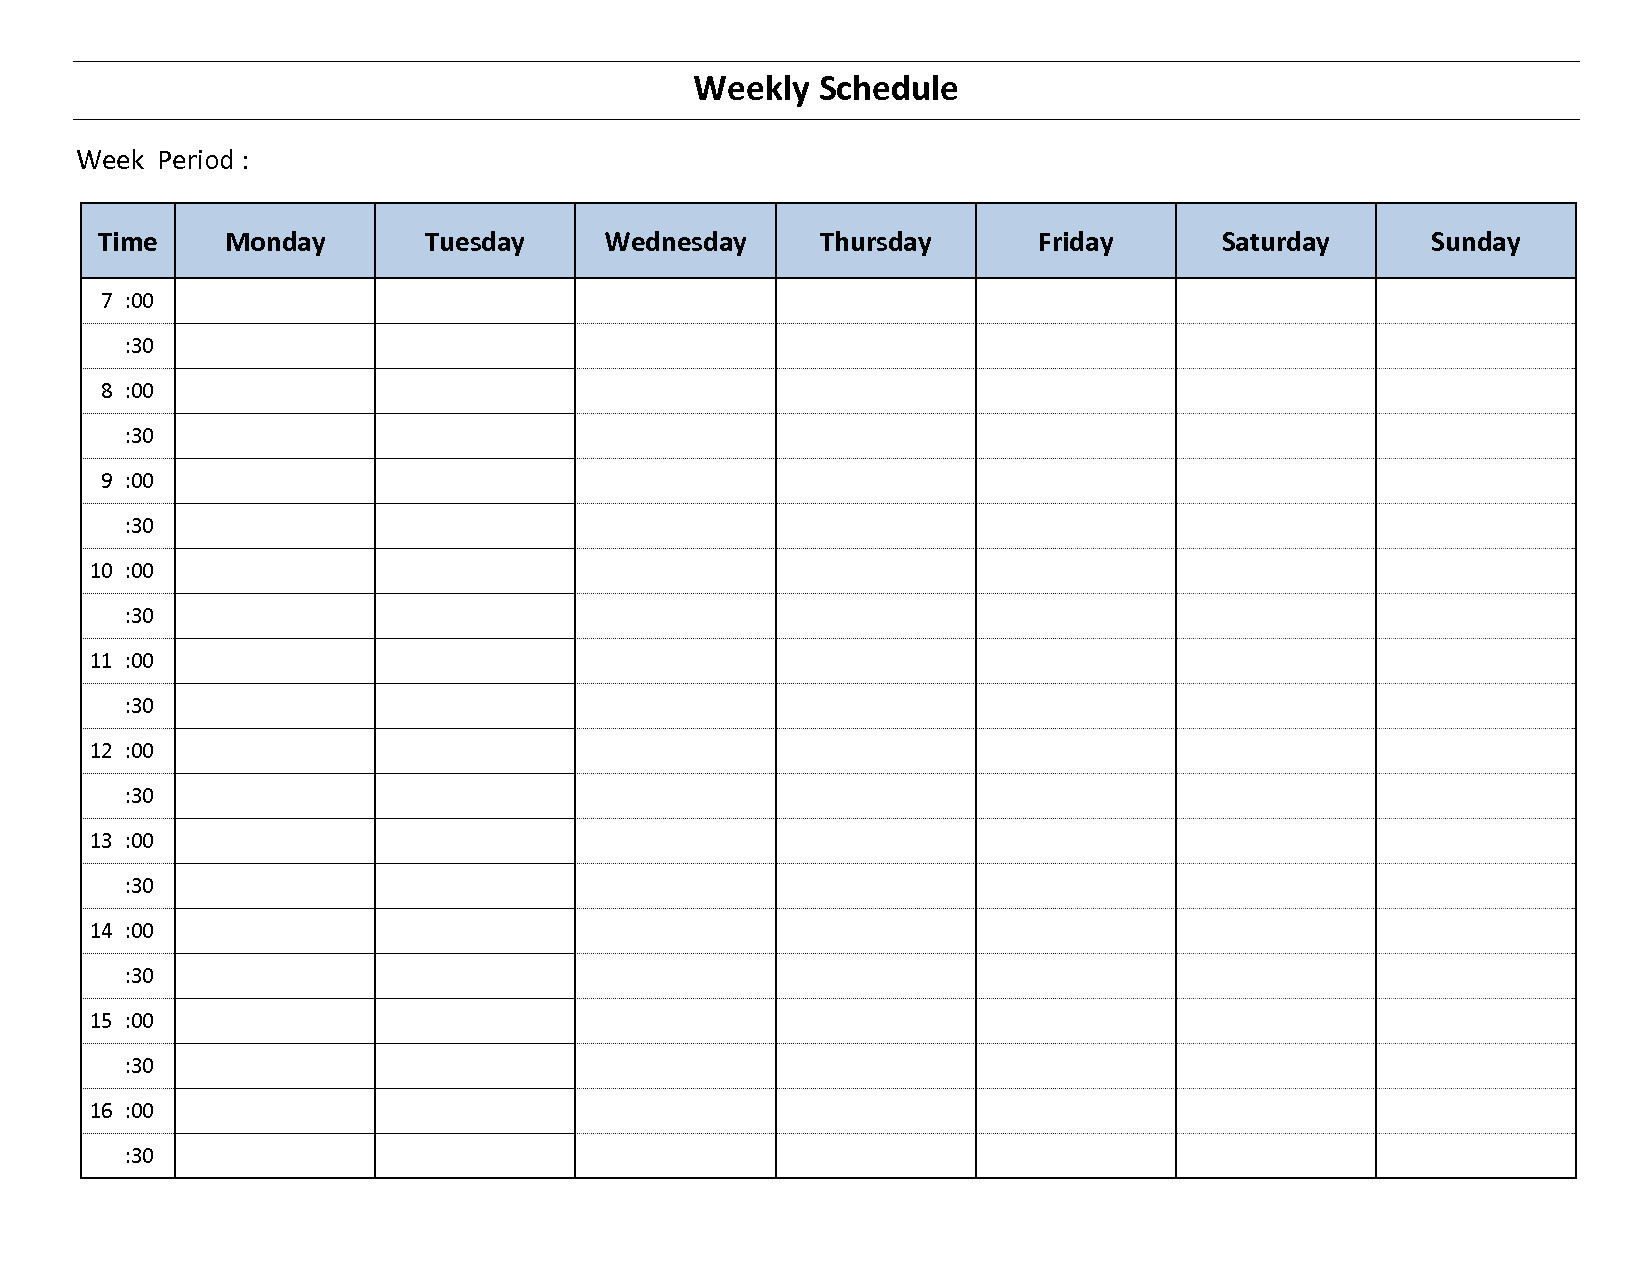 Week organizer Template Weekly Planner 2017 Template Schedule Planner Get form